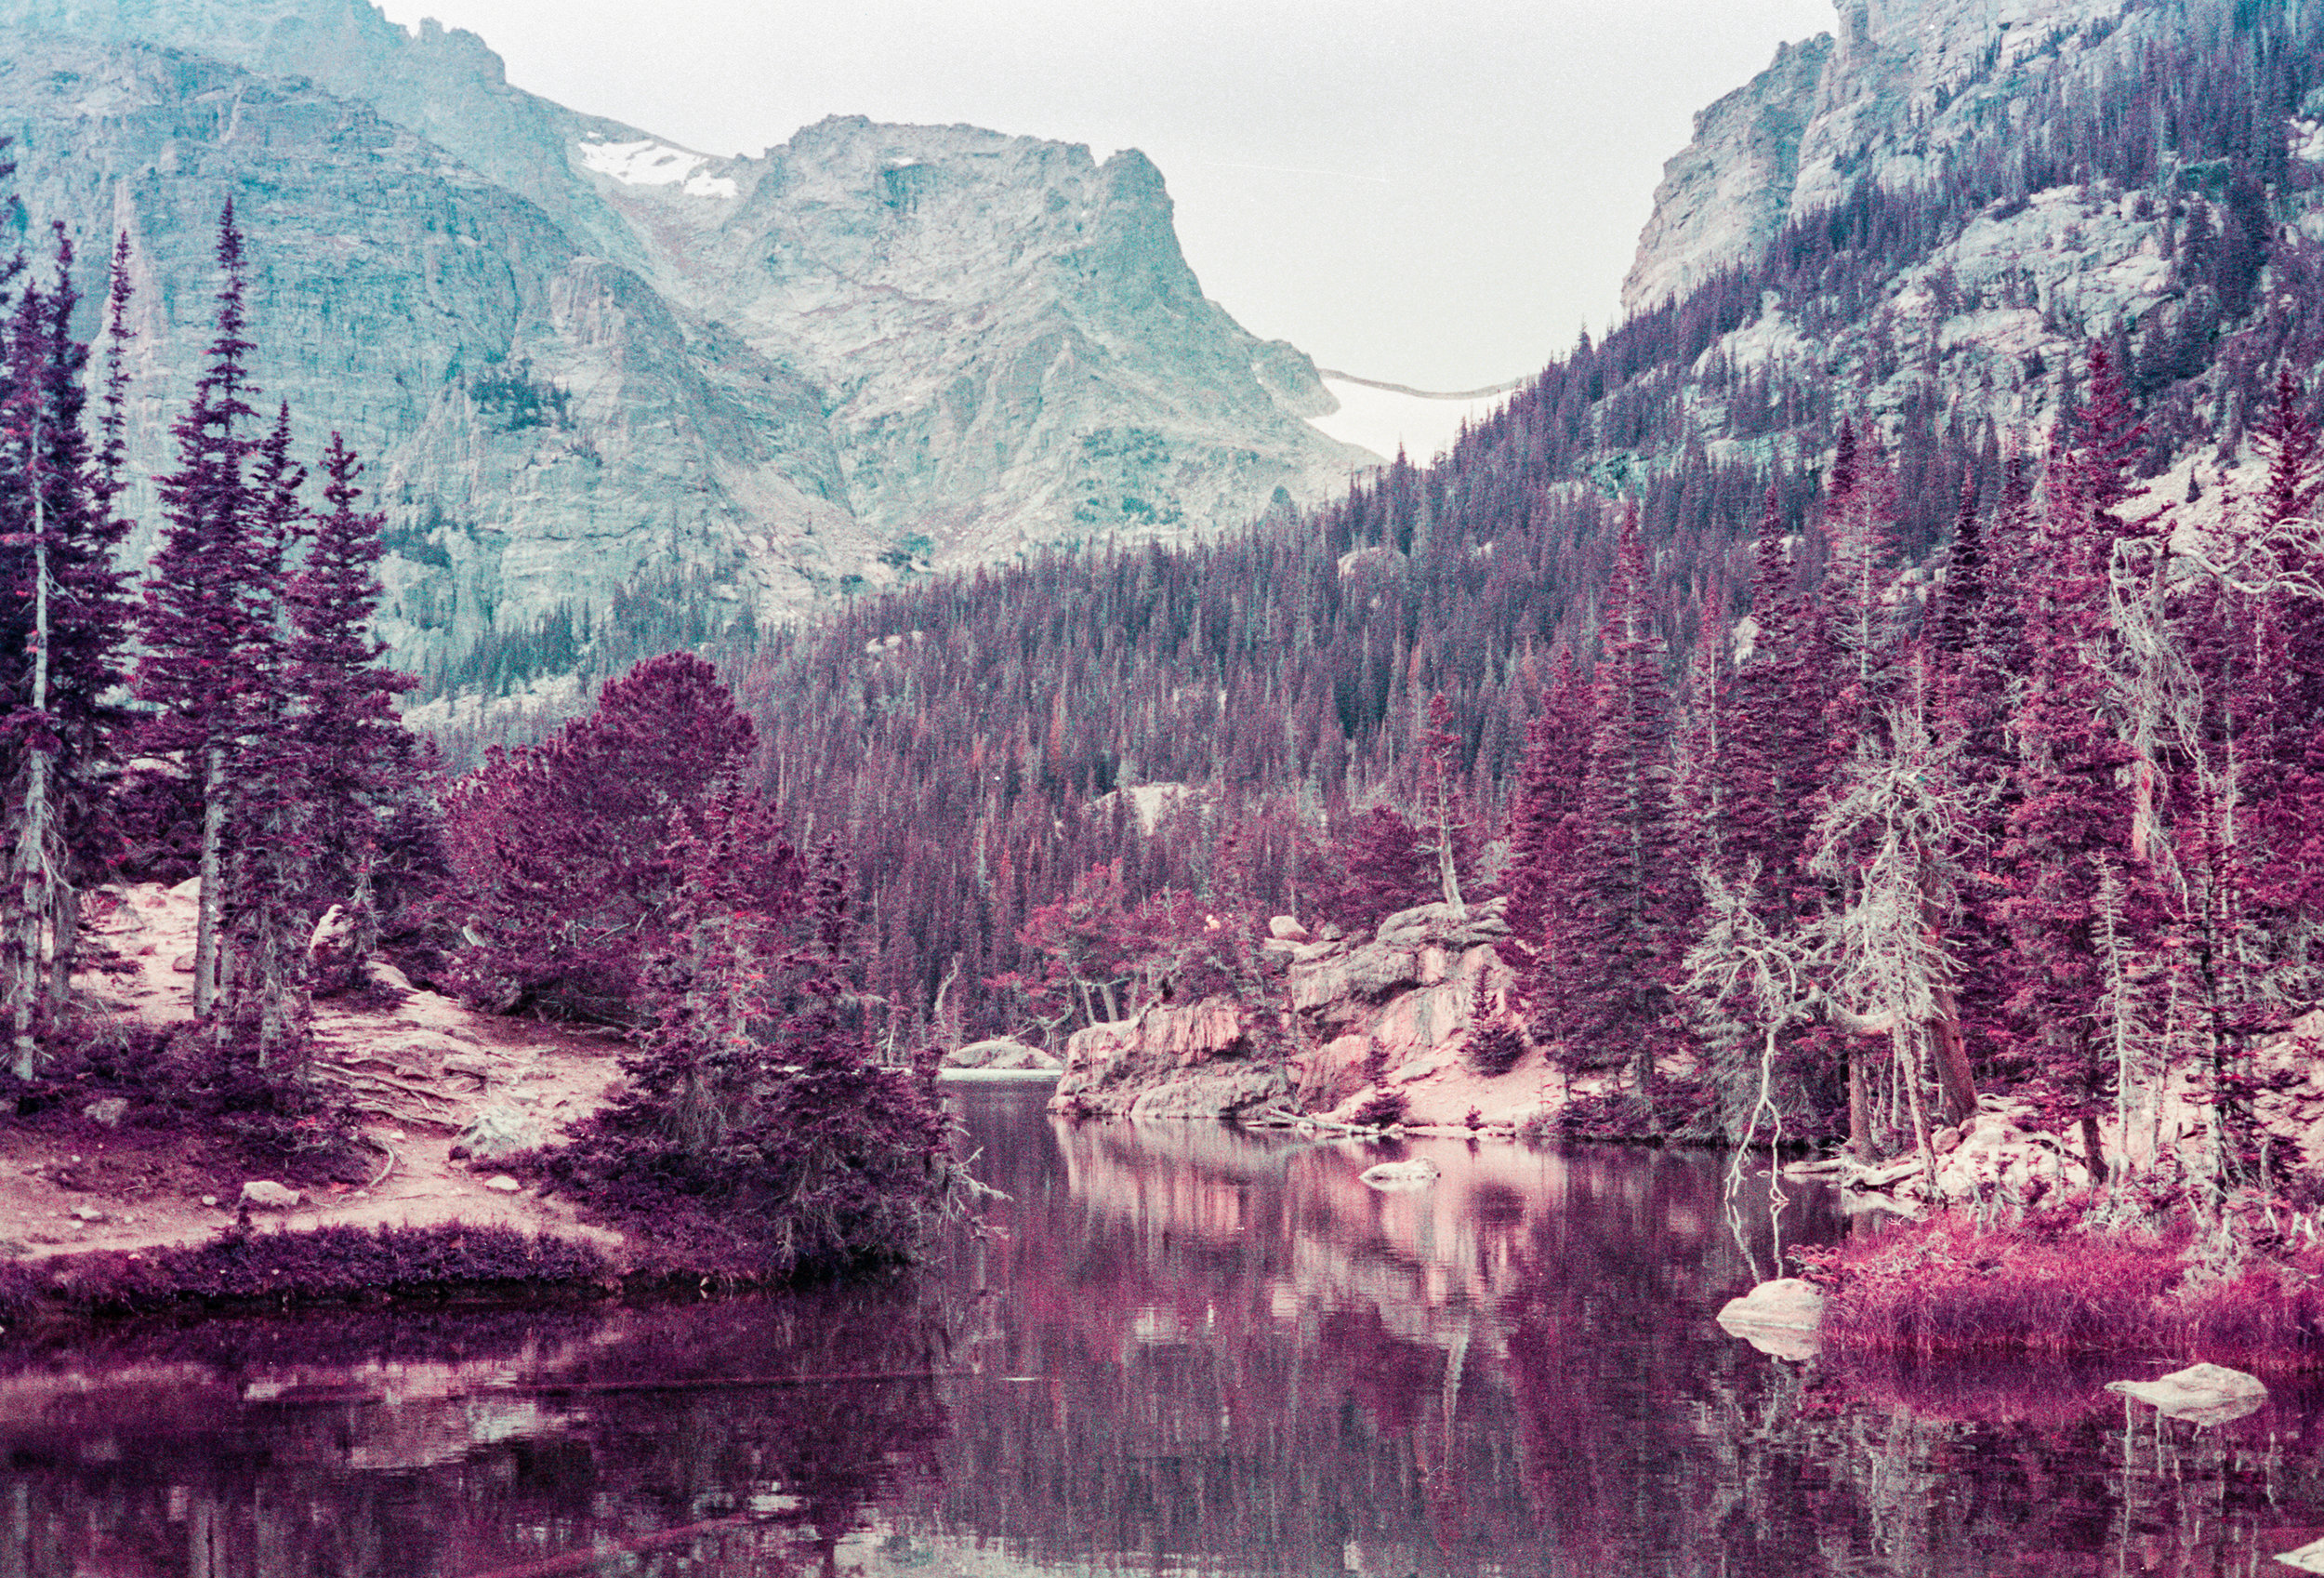 Lake Amethyst